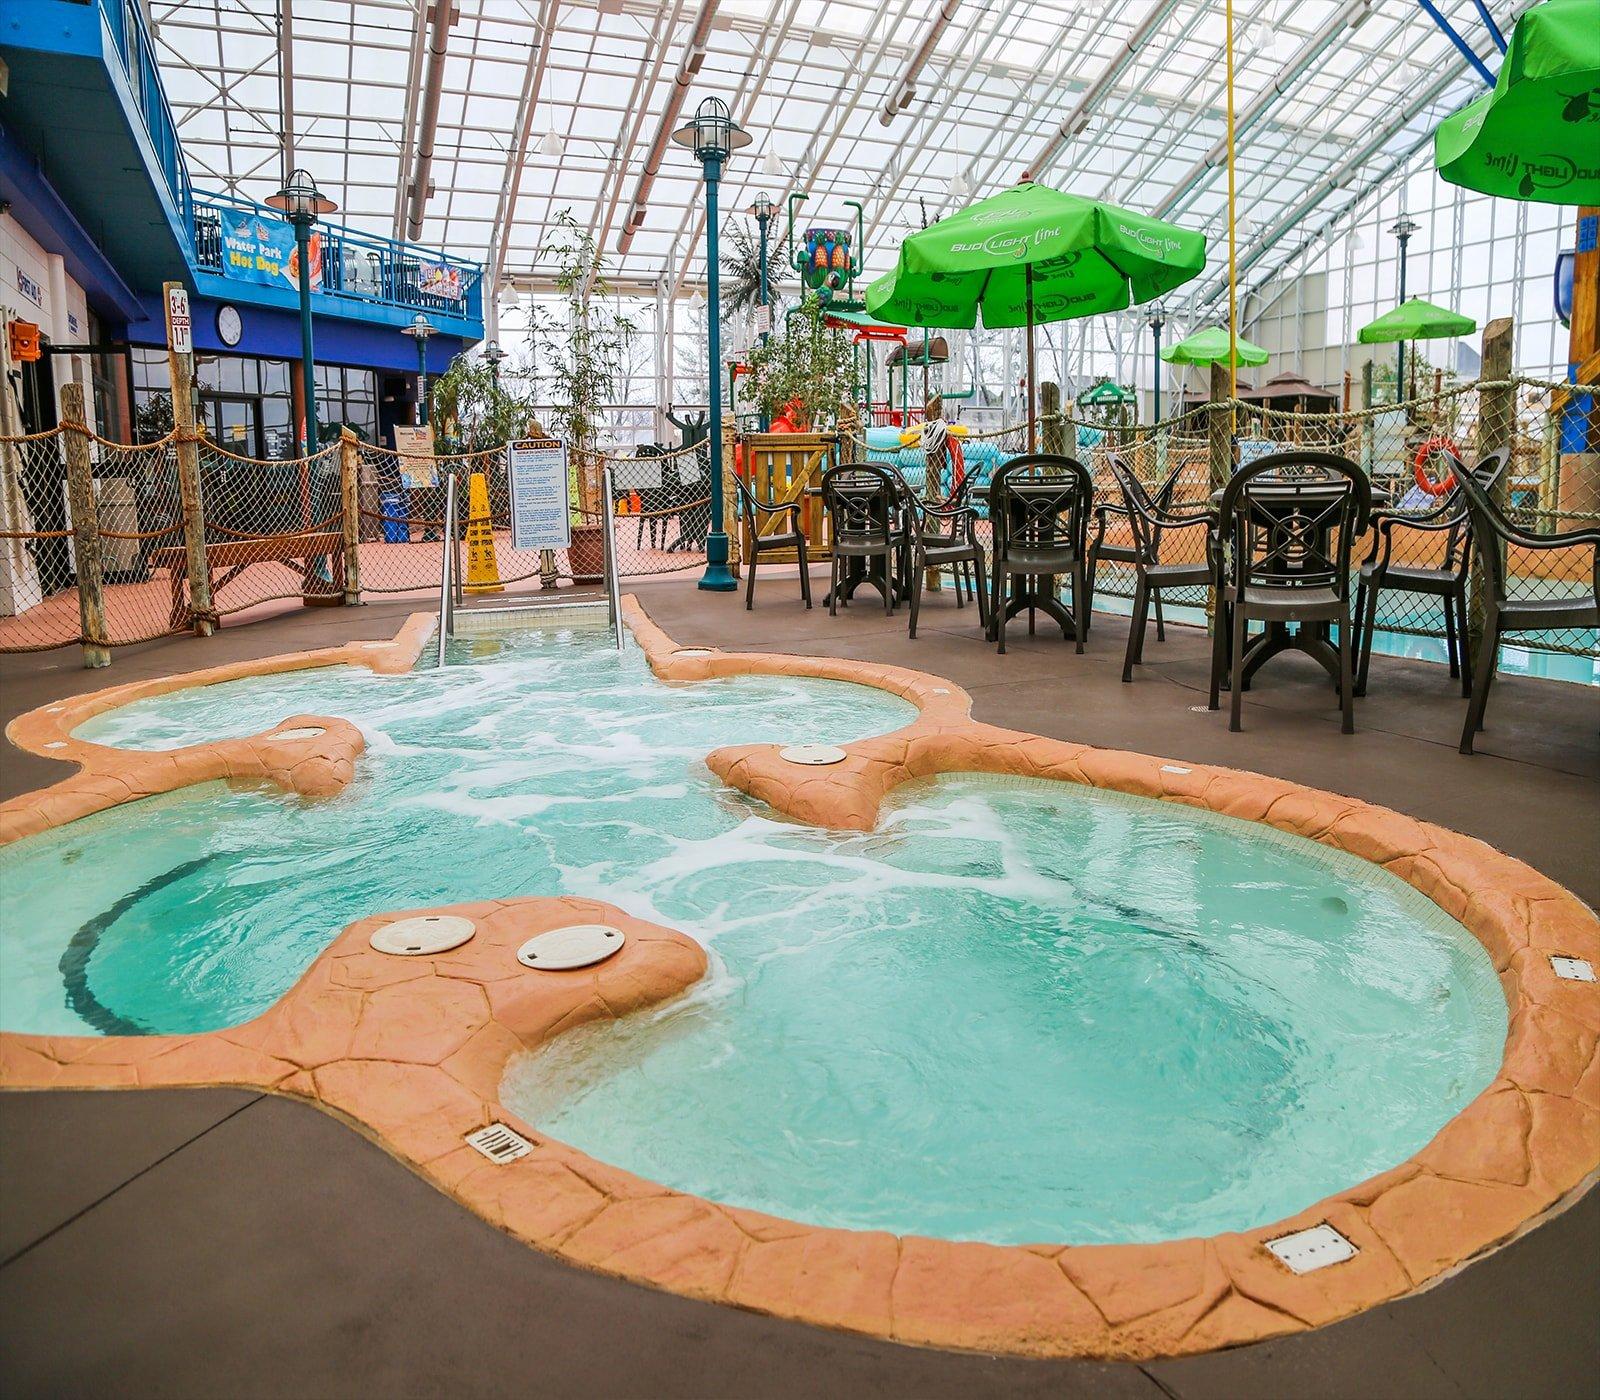 Waves Indoor Waterpark Things To Do Niagara Falls Canada